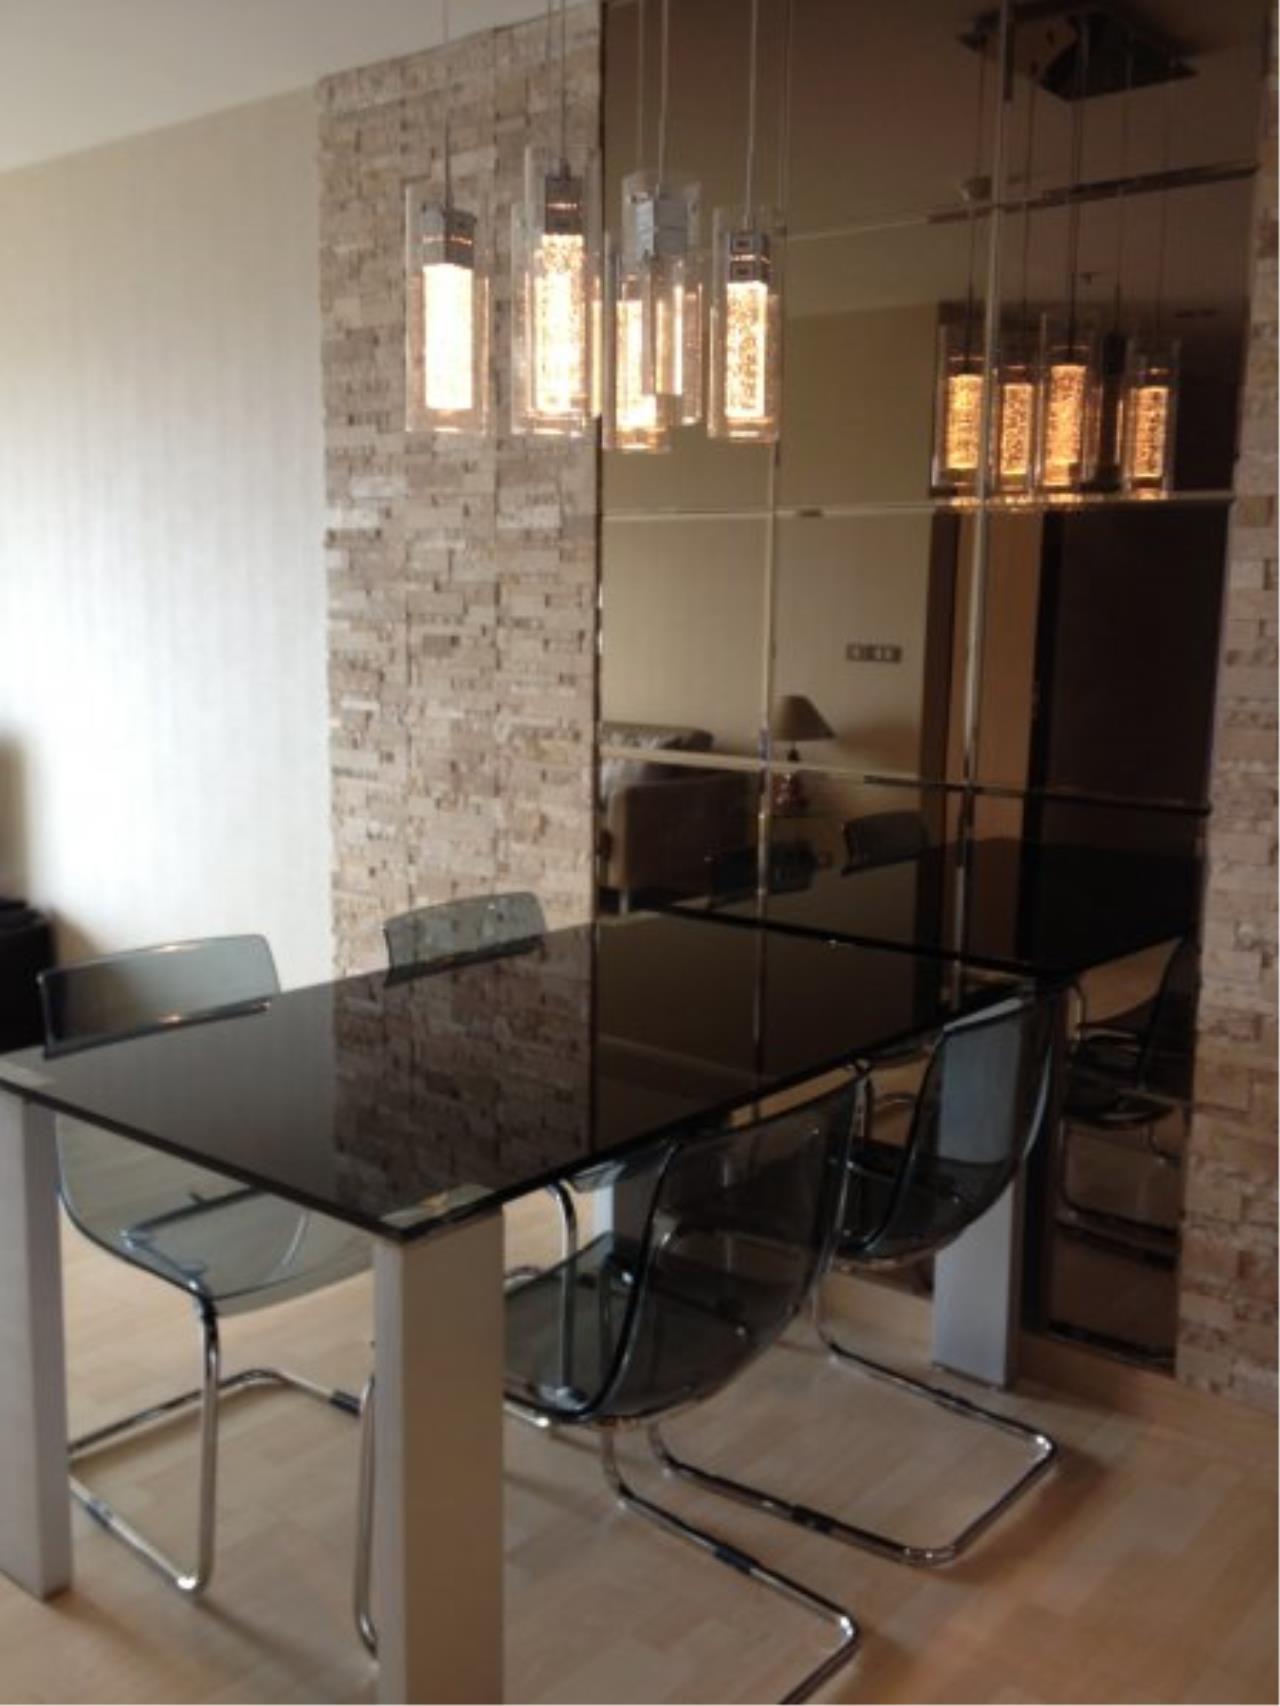 Piri Property Agency's Modern 2 Bedrooms in the 59 Heritage Bulding for rent on high floor 1